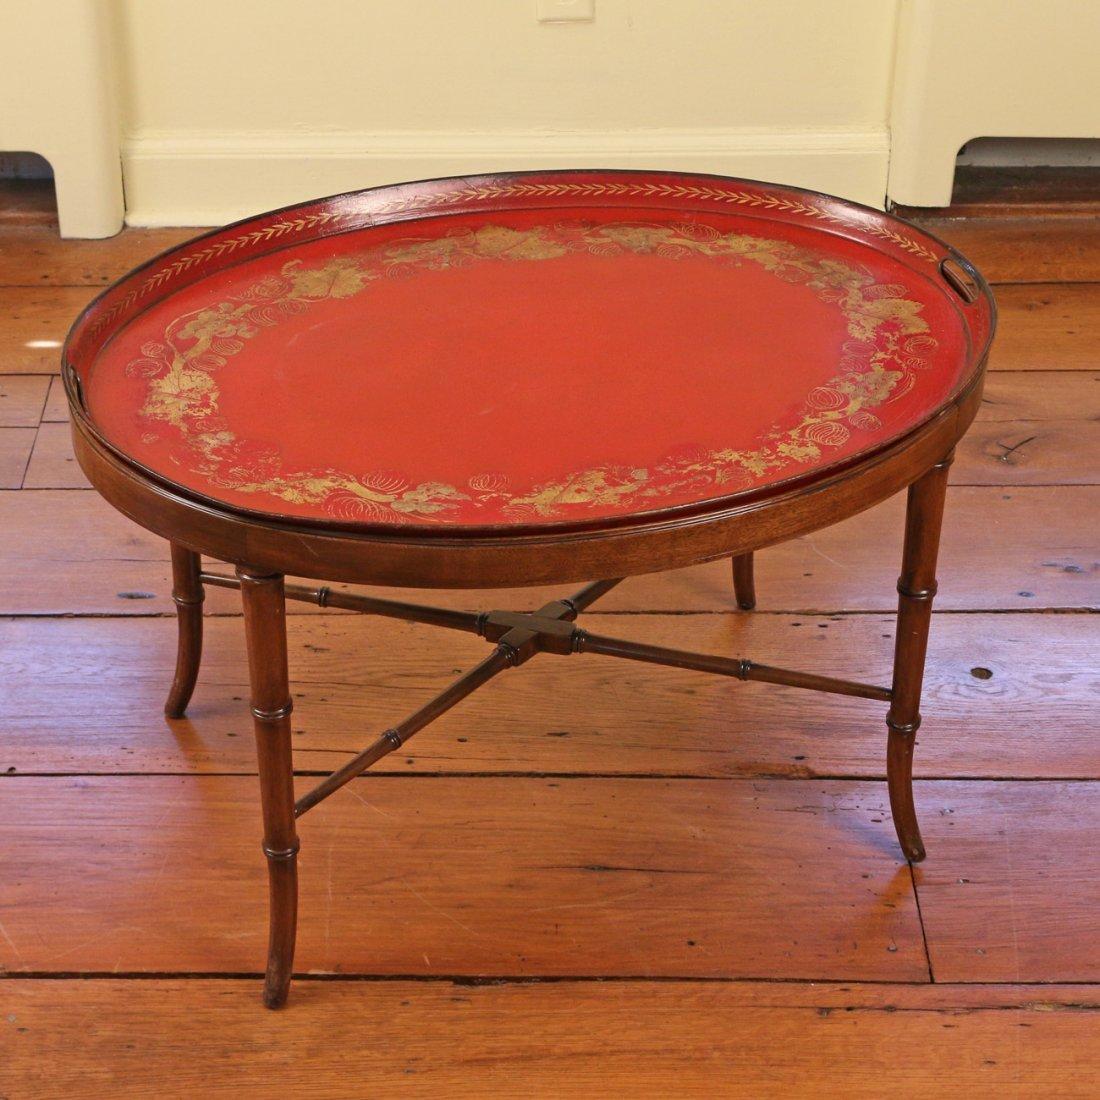 19th C. TOLE-PEINTE TRAY TABLE